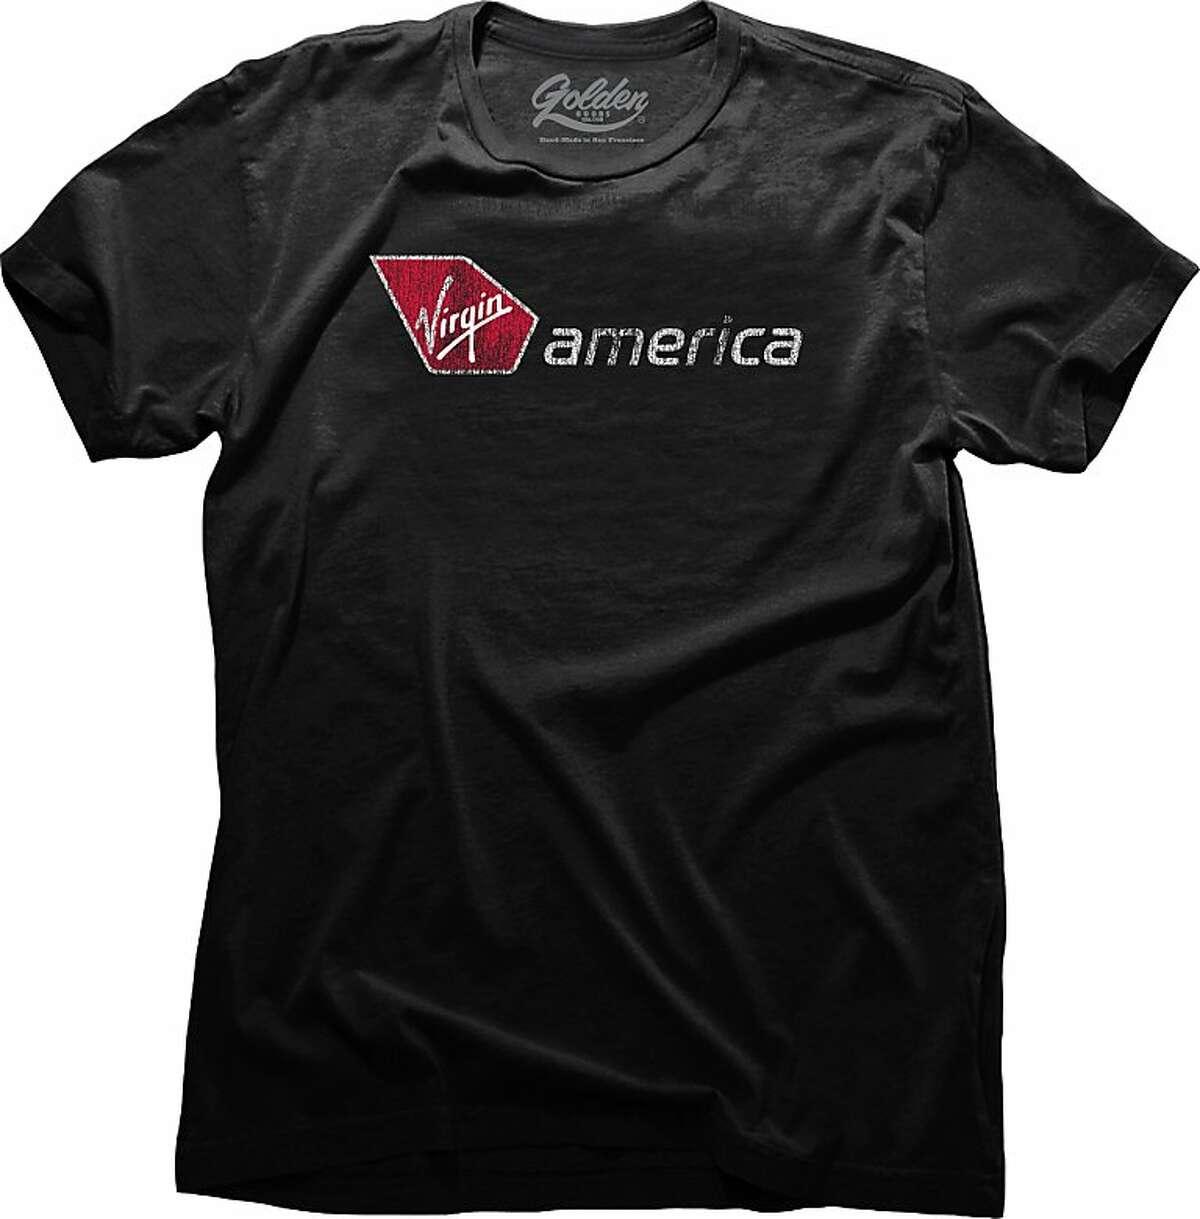 Virgin America design by Golden Goods